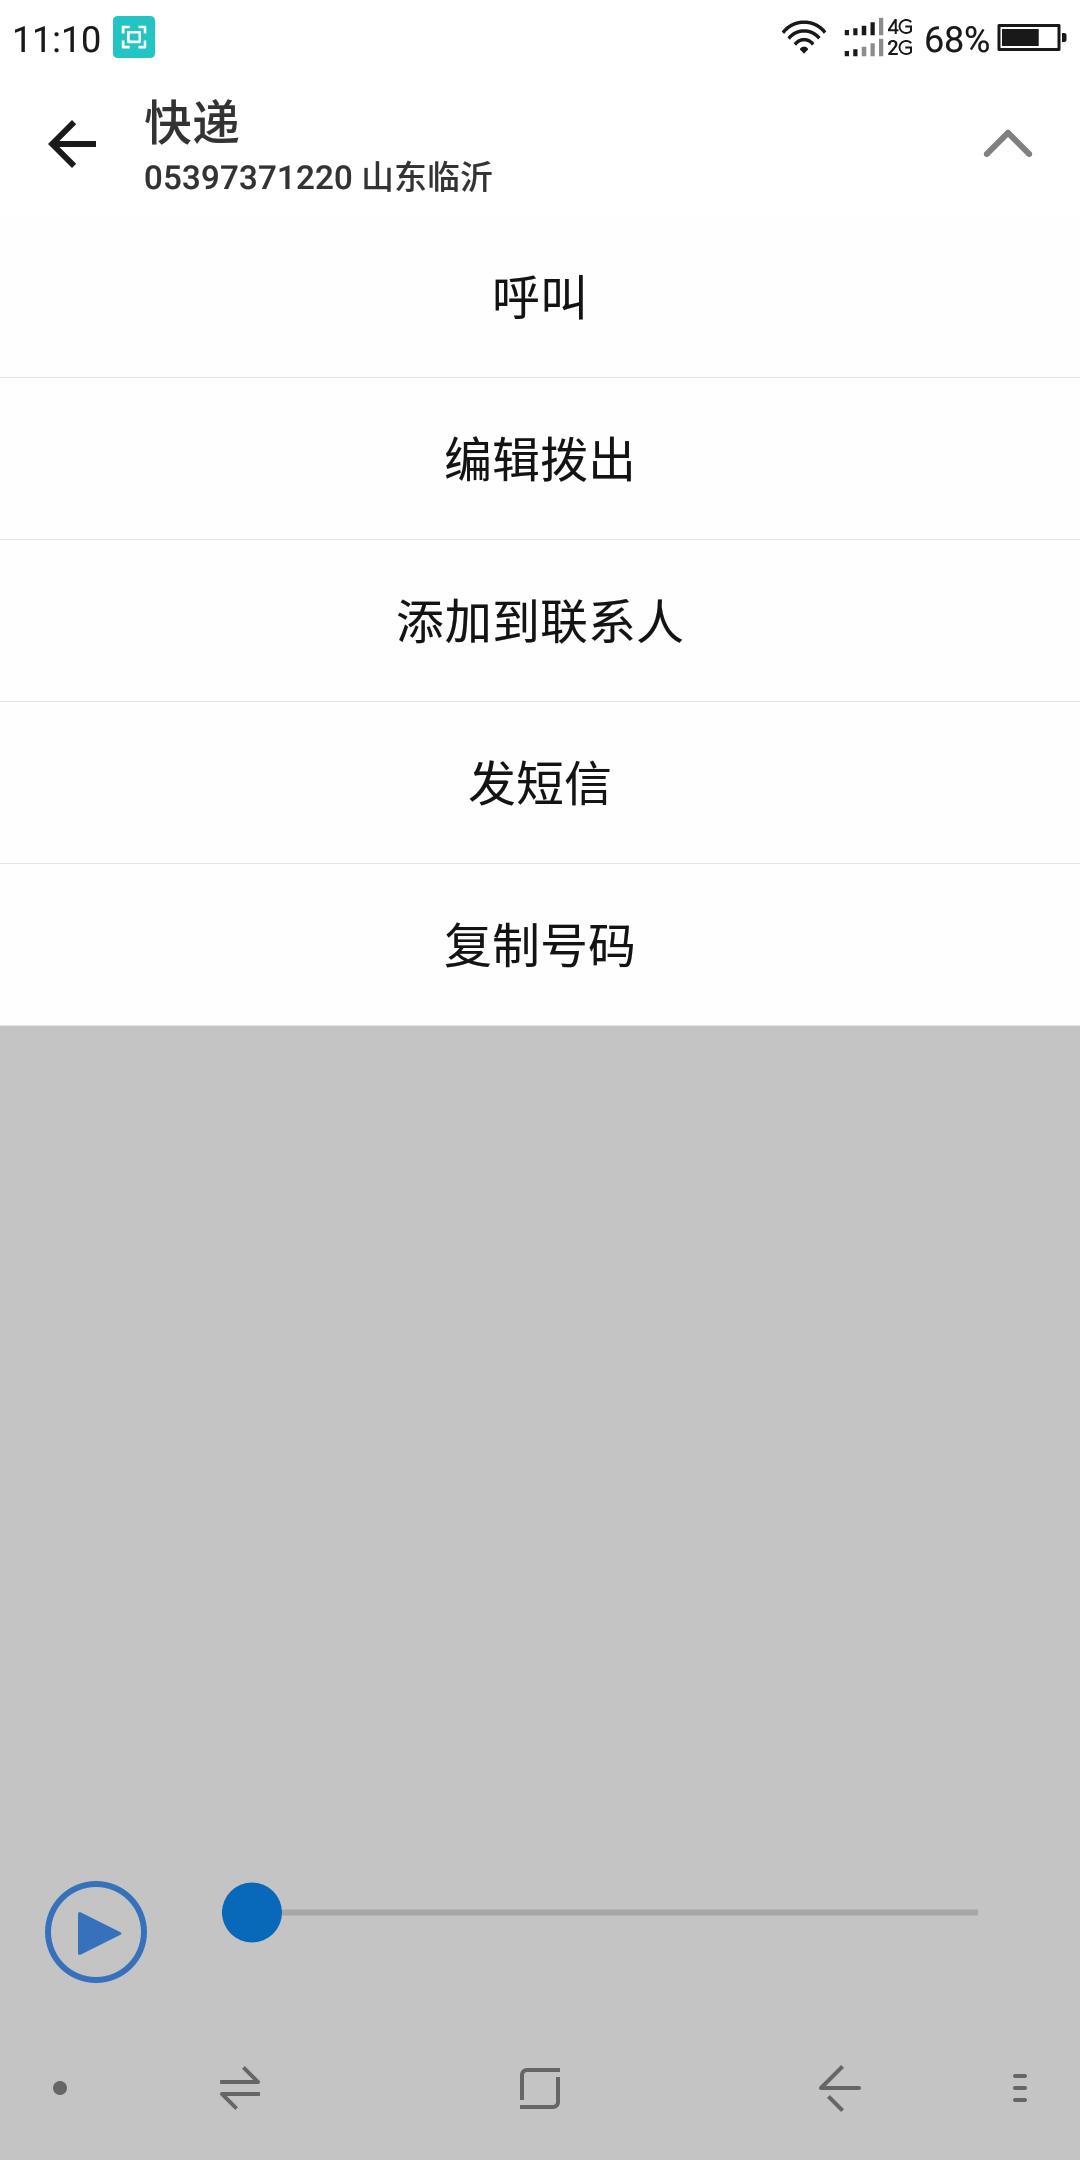 Screenshot_2018-07-29-11-10-25.png